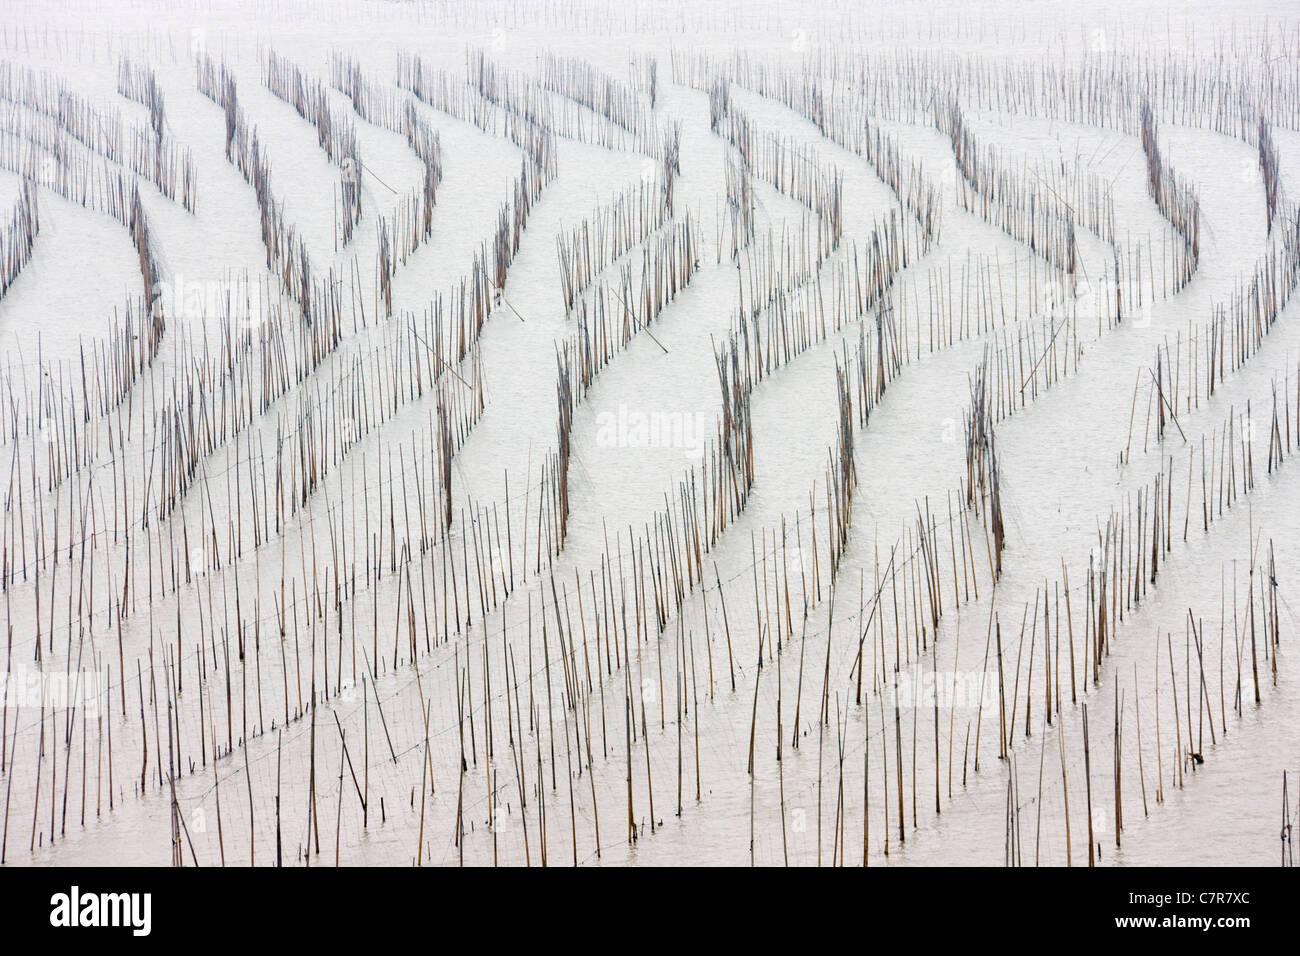 Bamboo sticks for drying seaweed, East China Sea, Xiapu, Fujian, China - Stock Image